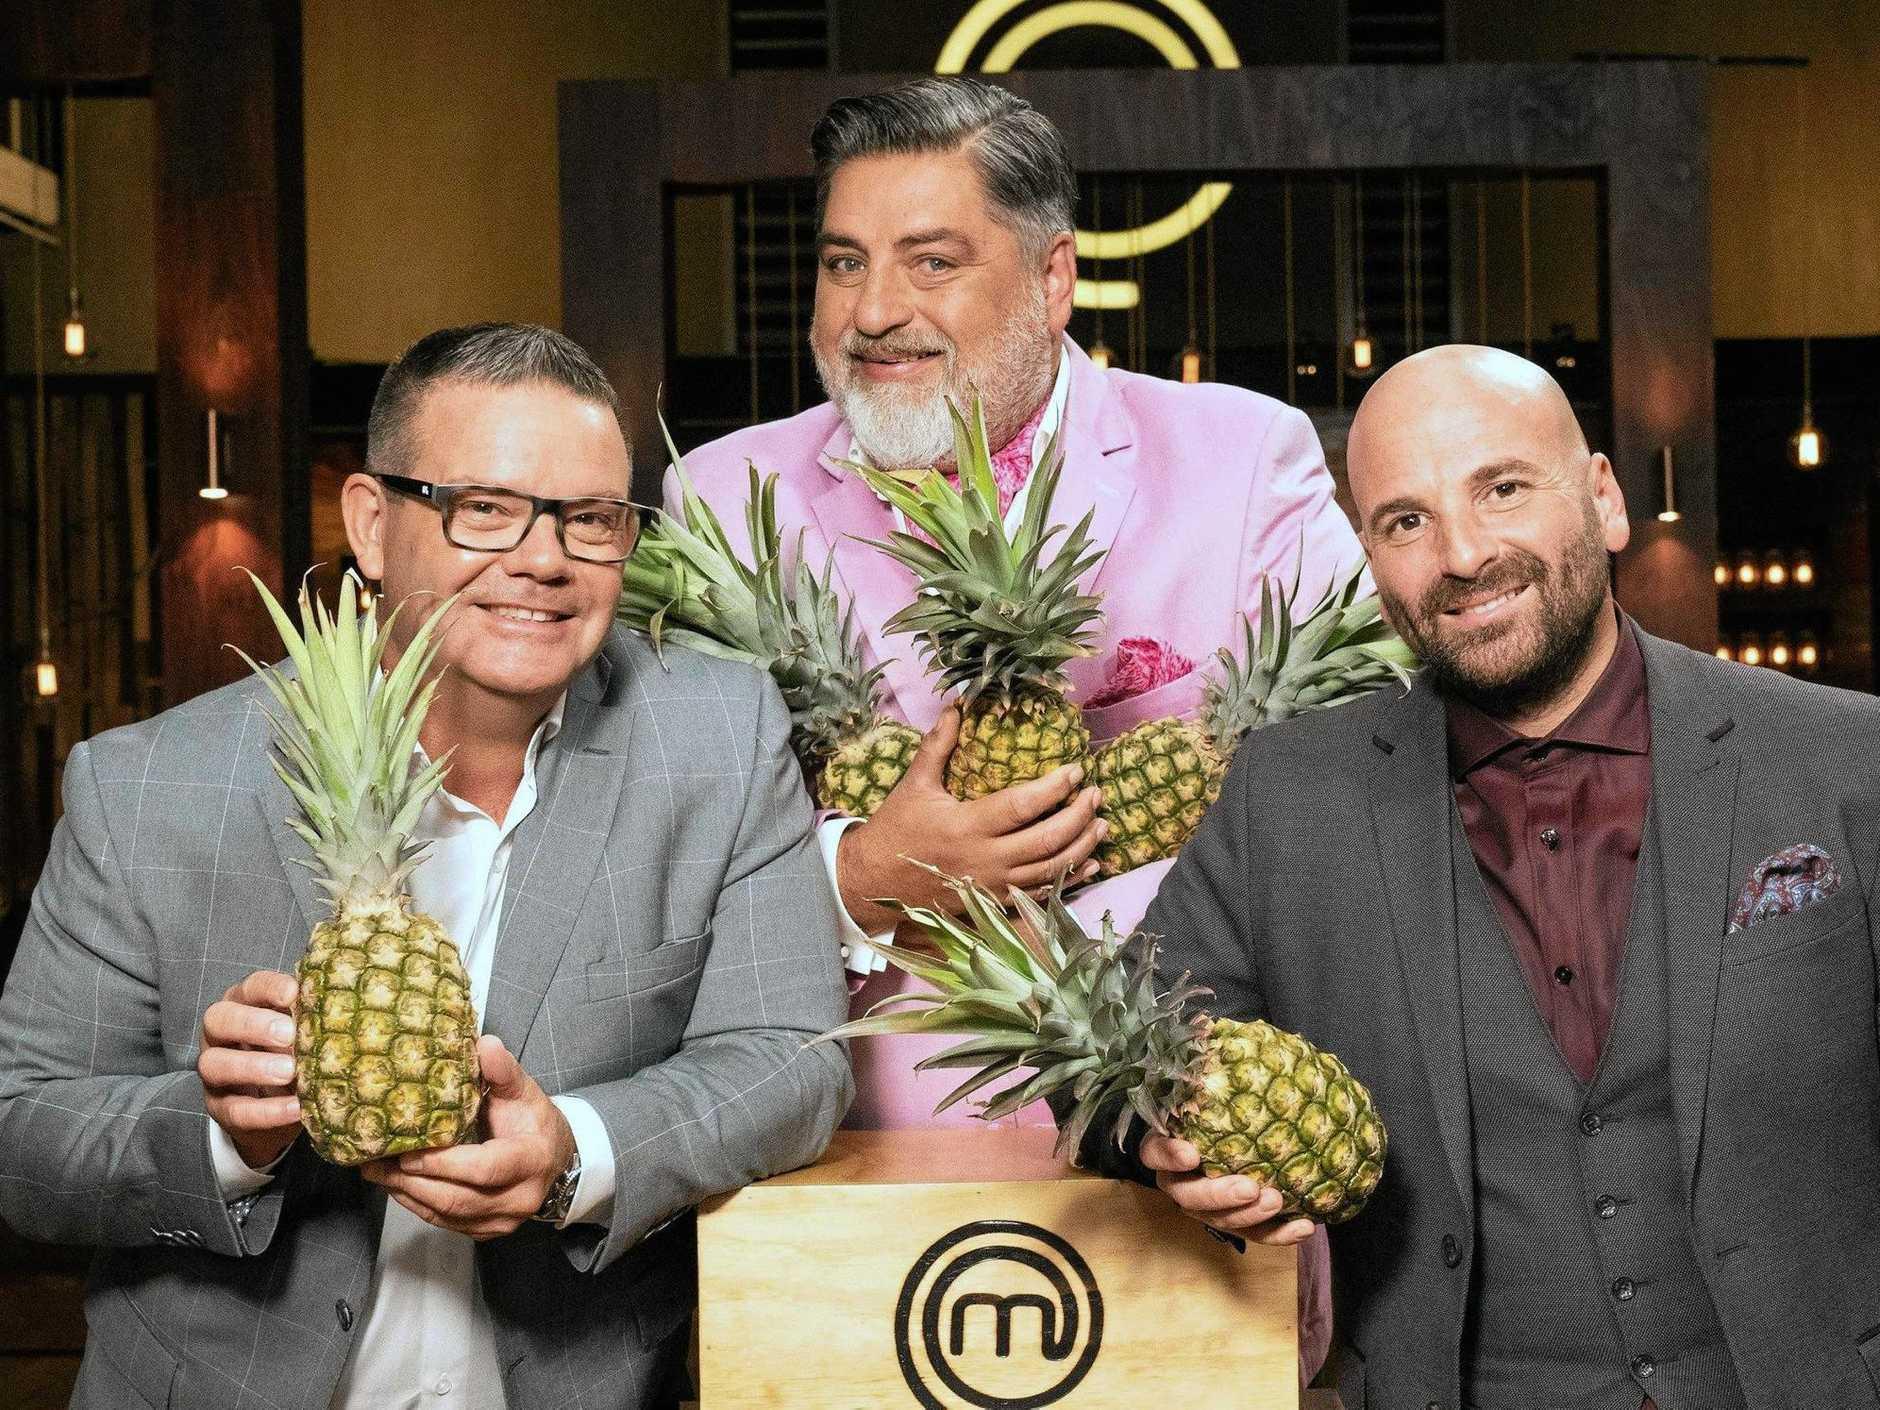 MasterChef judges Gary Mehigan, Matt Preston and George Calombaris are finally filming in Queensland after 10 seasons.